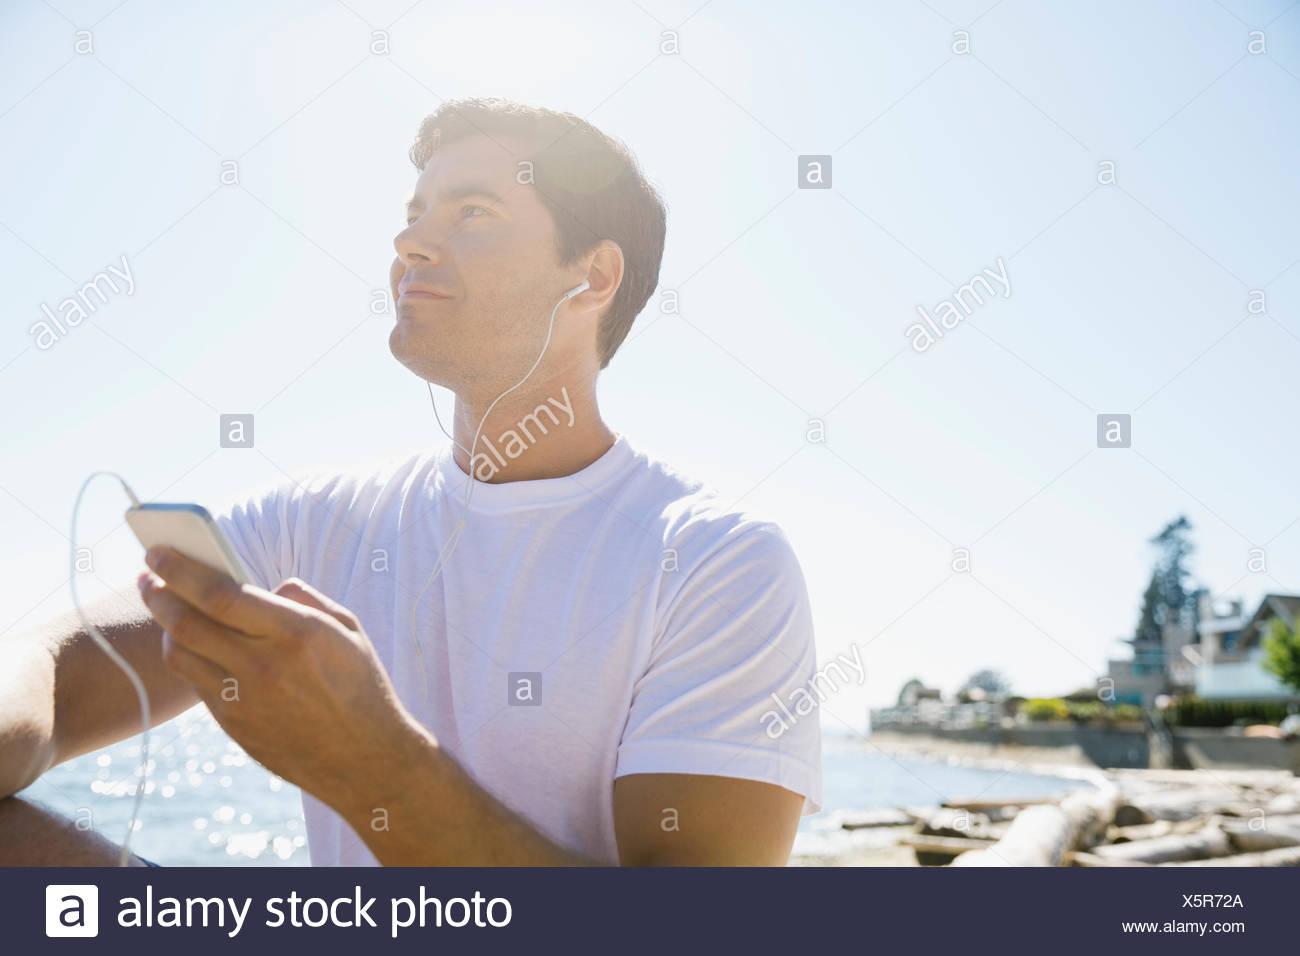 Runner listening to mp3 player on beach Photo Stock